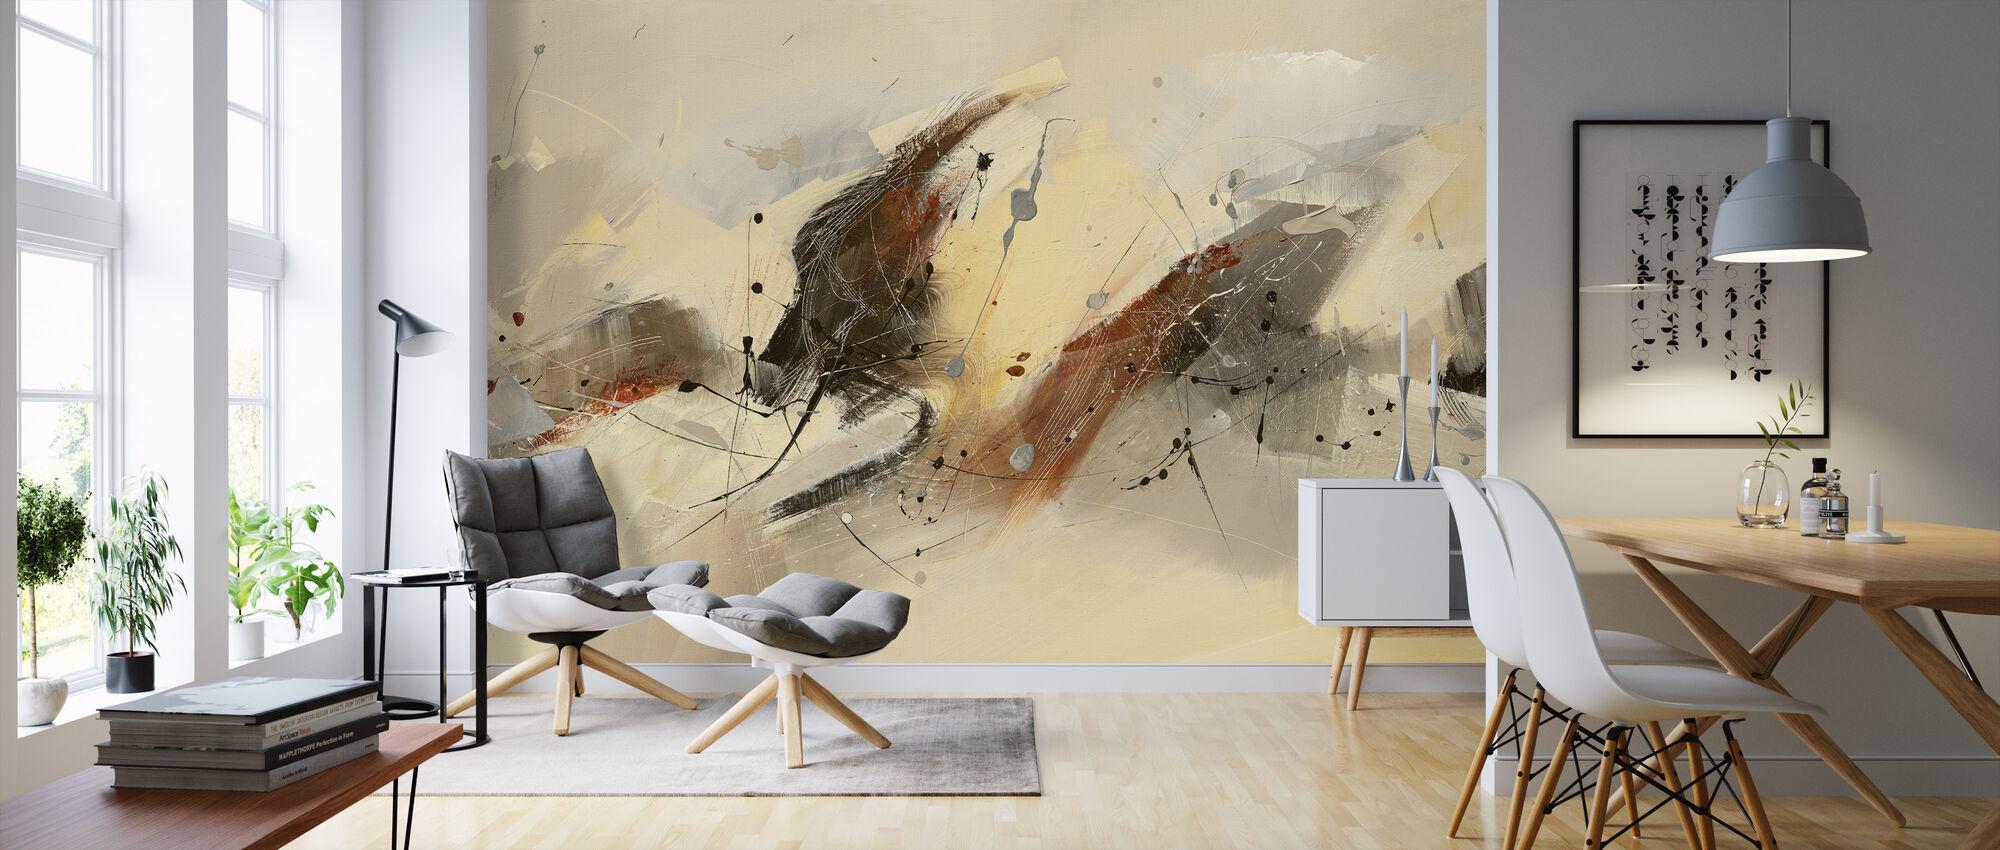 farandole fototapete nach ma photowall. Black Bedroom Furniture Sets. Home Design Ideas